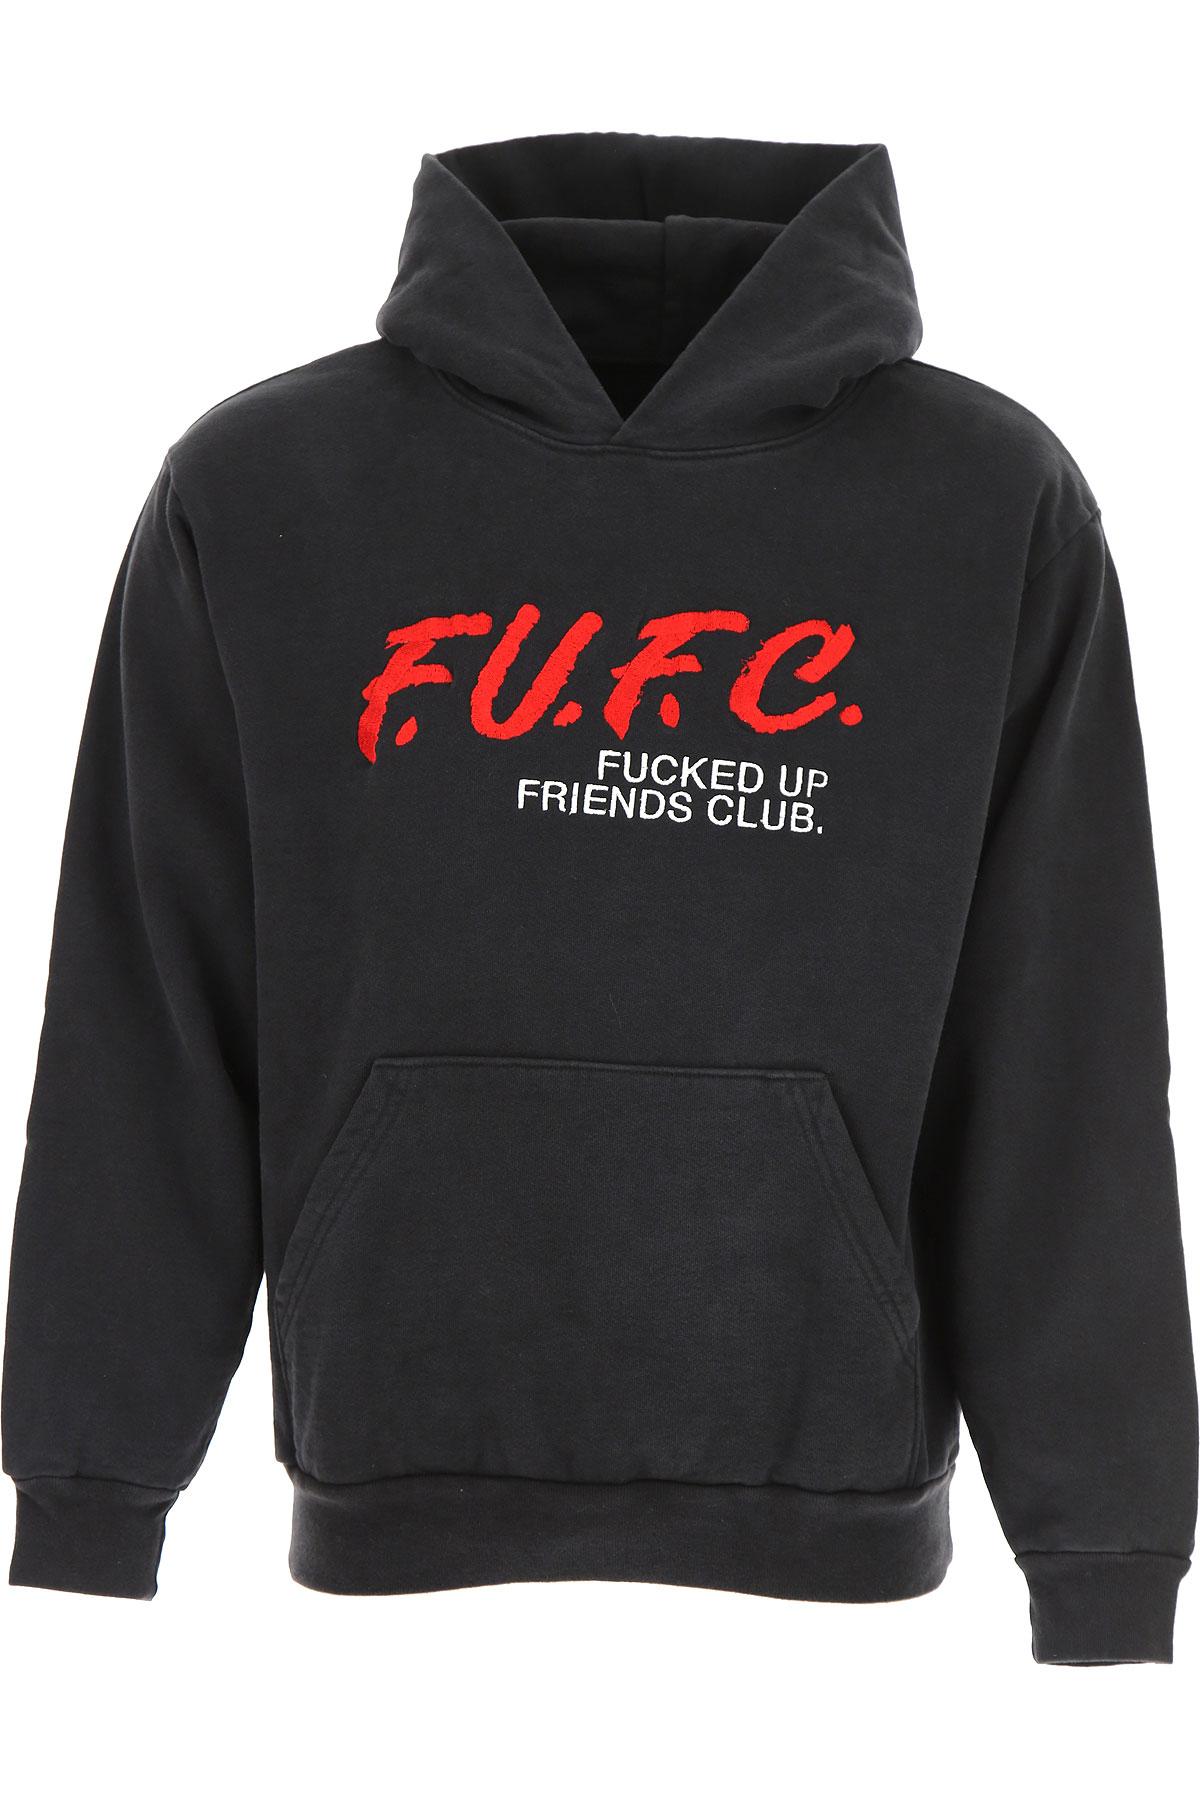 Image of Local Authority Sweatshirt for Men, Black, Cotton, 2017, 2 - Uk/Usa M - Ita 48 3 - Uk/Usa L - Ita 50